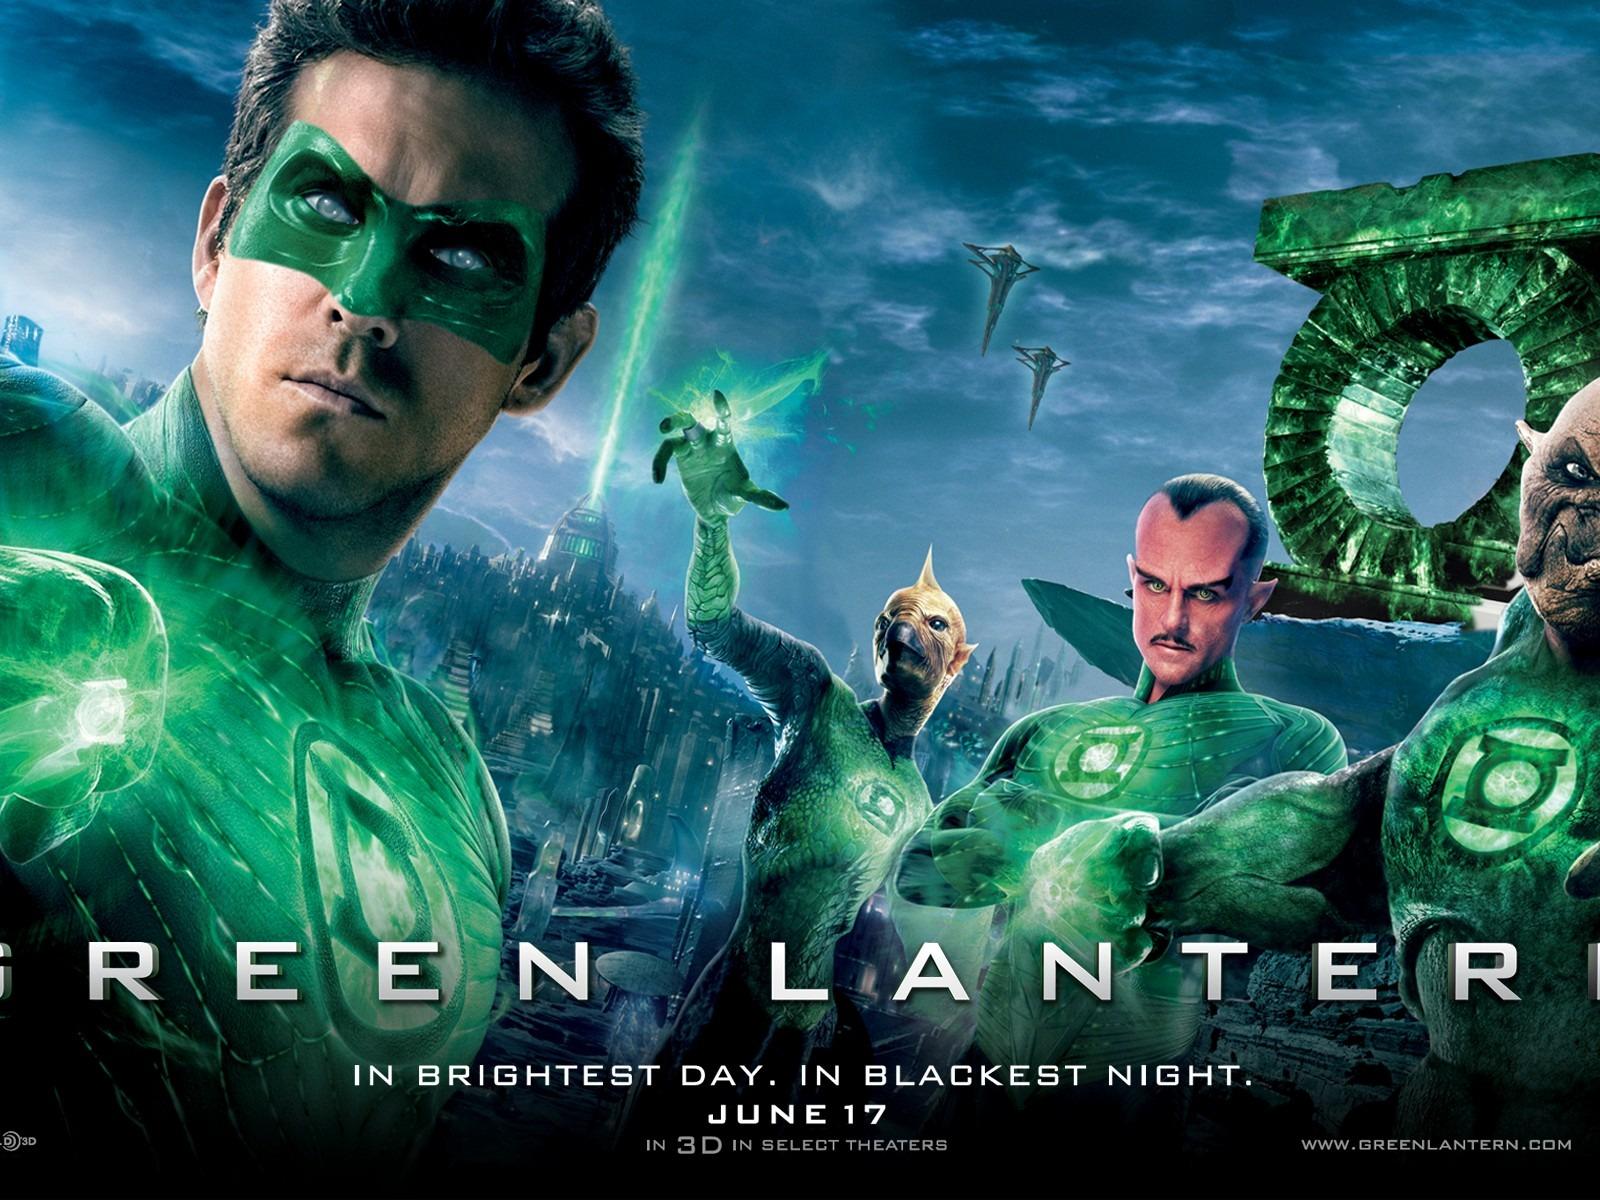 Green Lantern movie poster wallpaper-1600x1200 Download ... Green Lantern Movie Poster